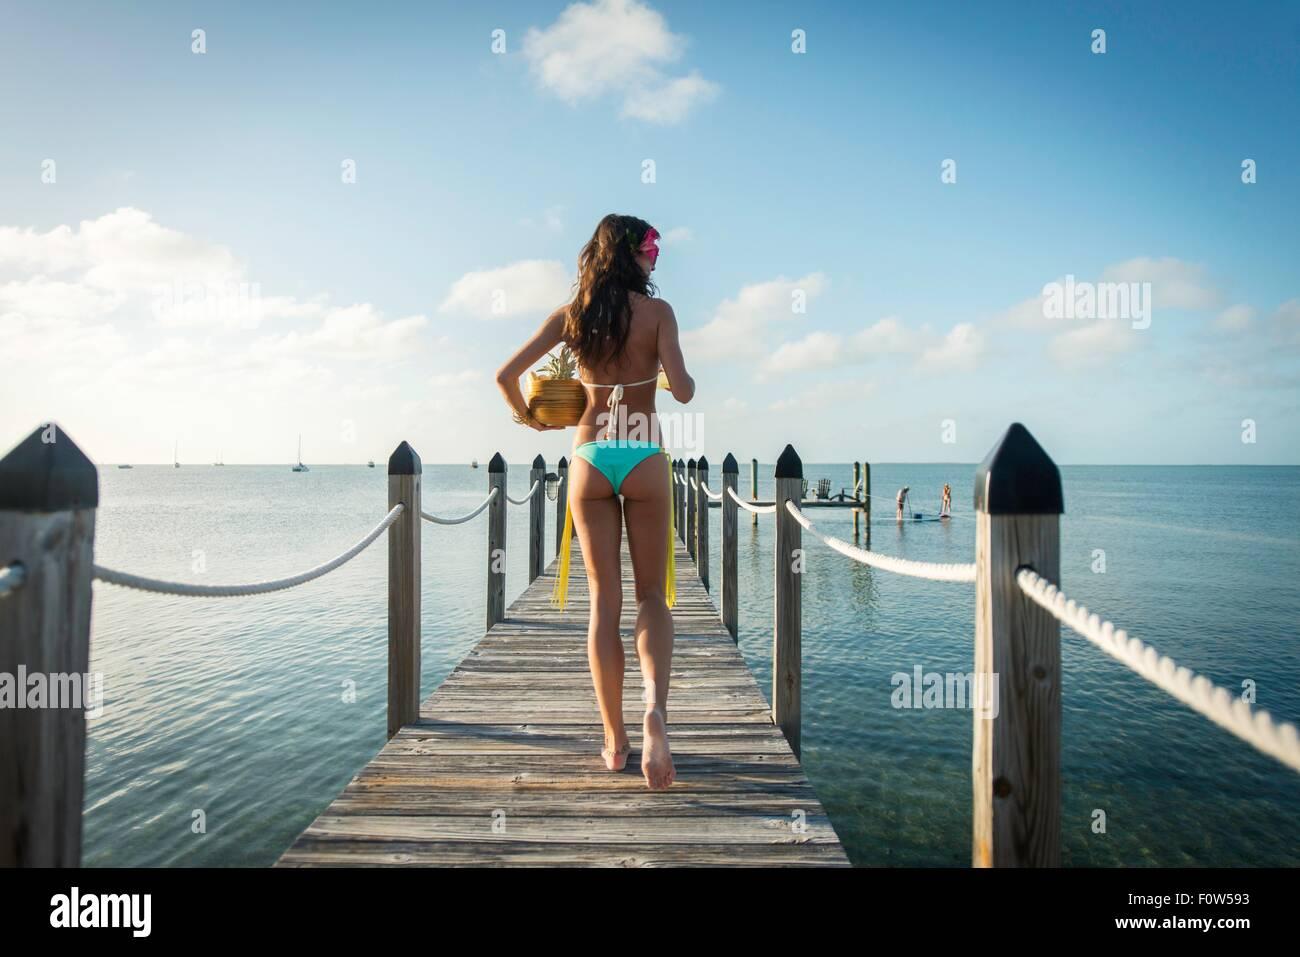 Vue arrière du jeune femme sur la jetée de mer exerçant son bol de fruits, Islamorada, Florida, USA Photo Stock